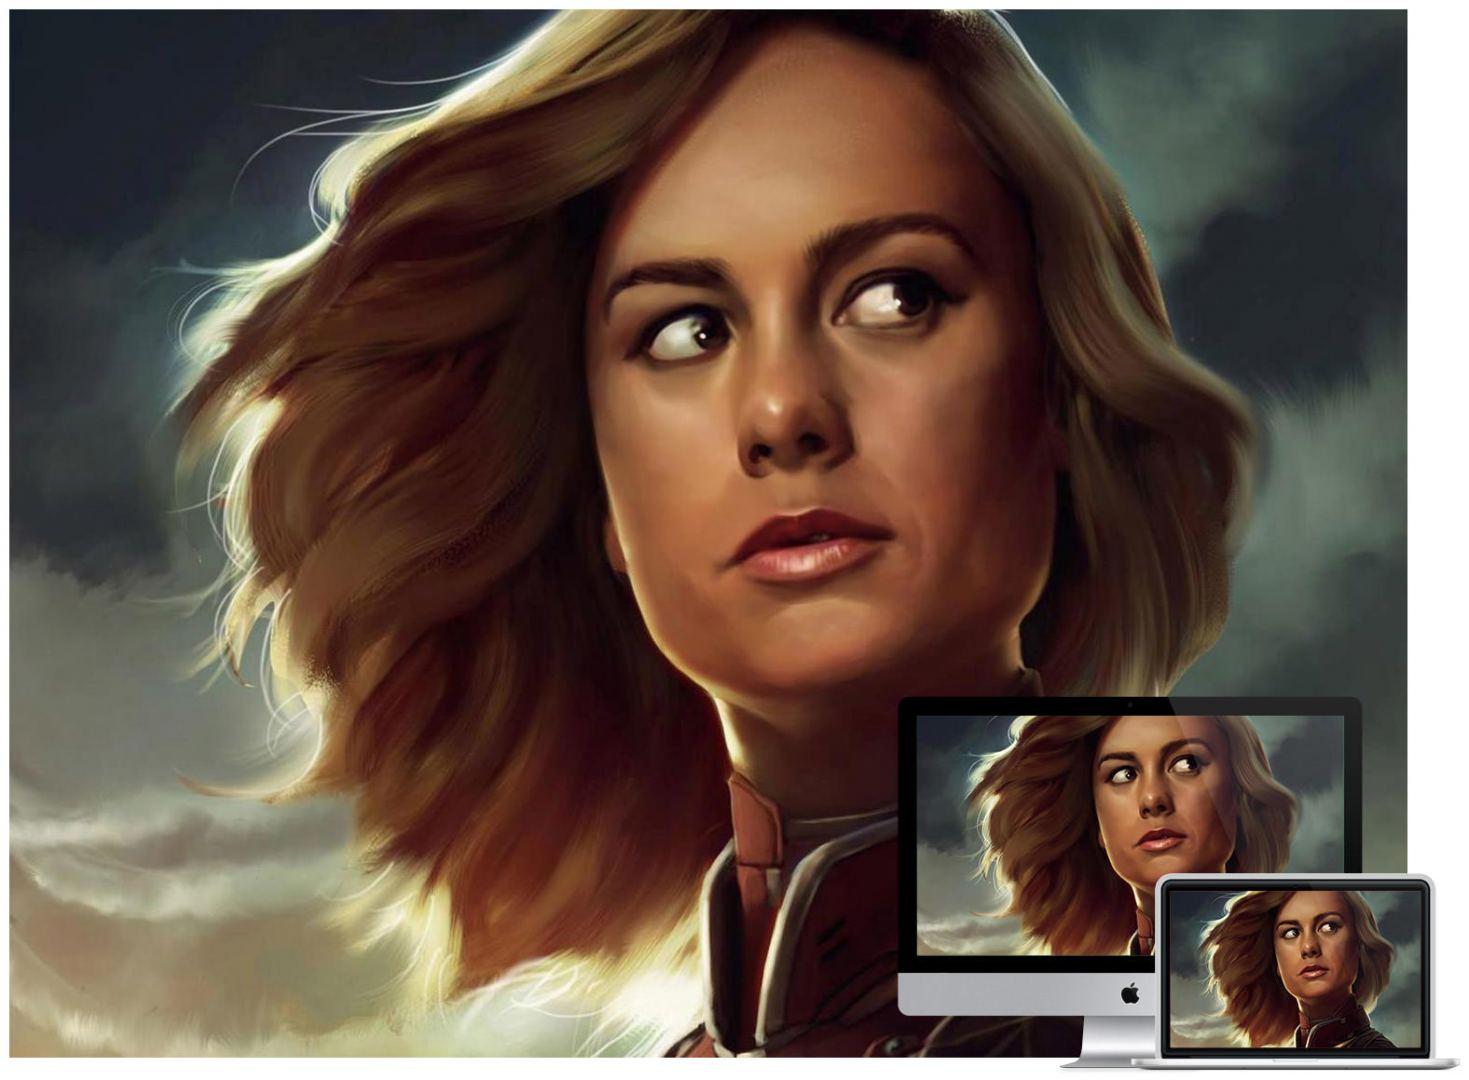 Brie Larson Artwork